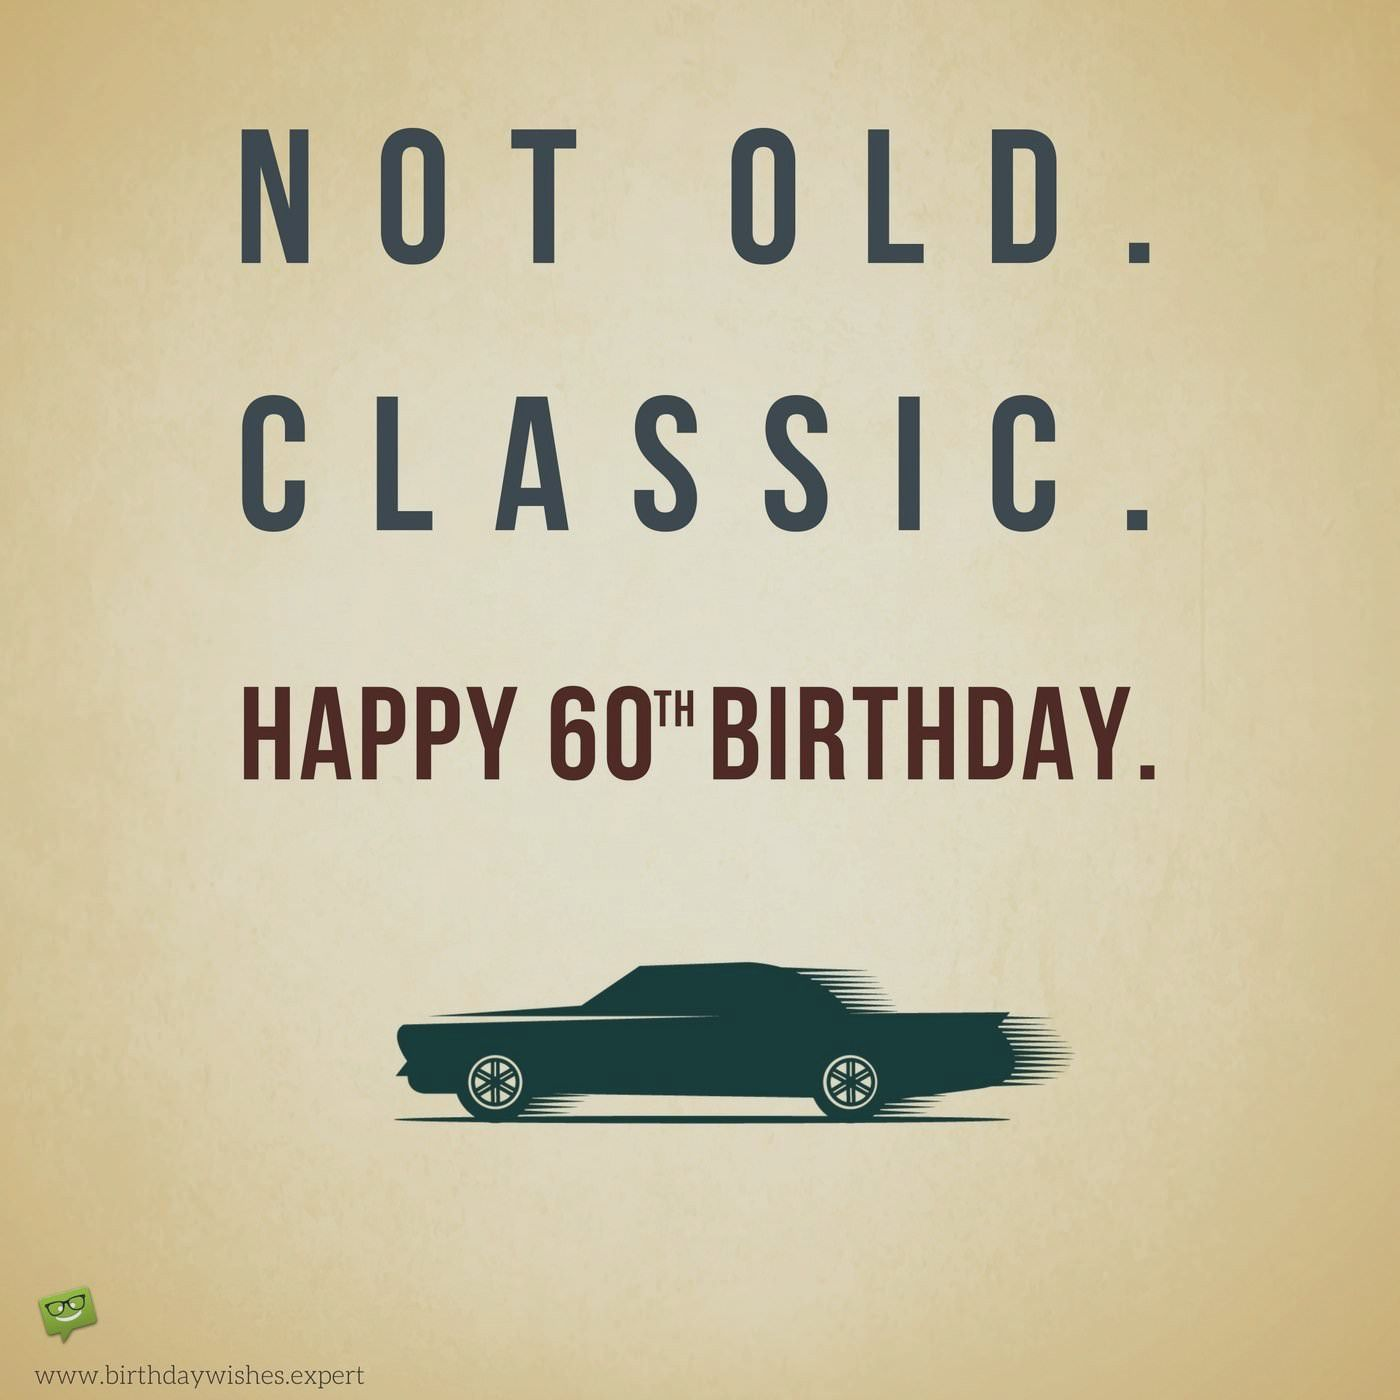 Unique 60th Birthday Gift In 2020 Happy 60th Birthday Wishes 60th Birthday Quotes Birthday Wishes Funny